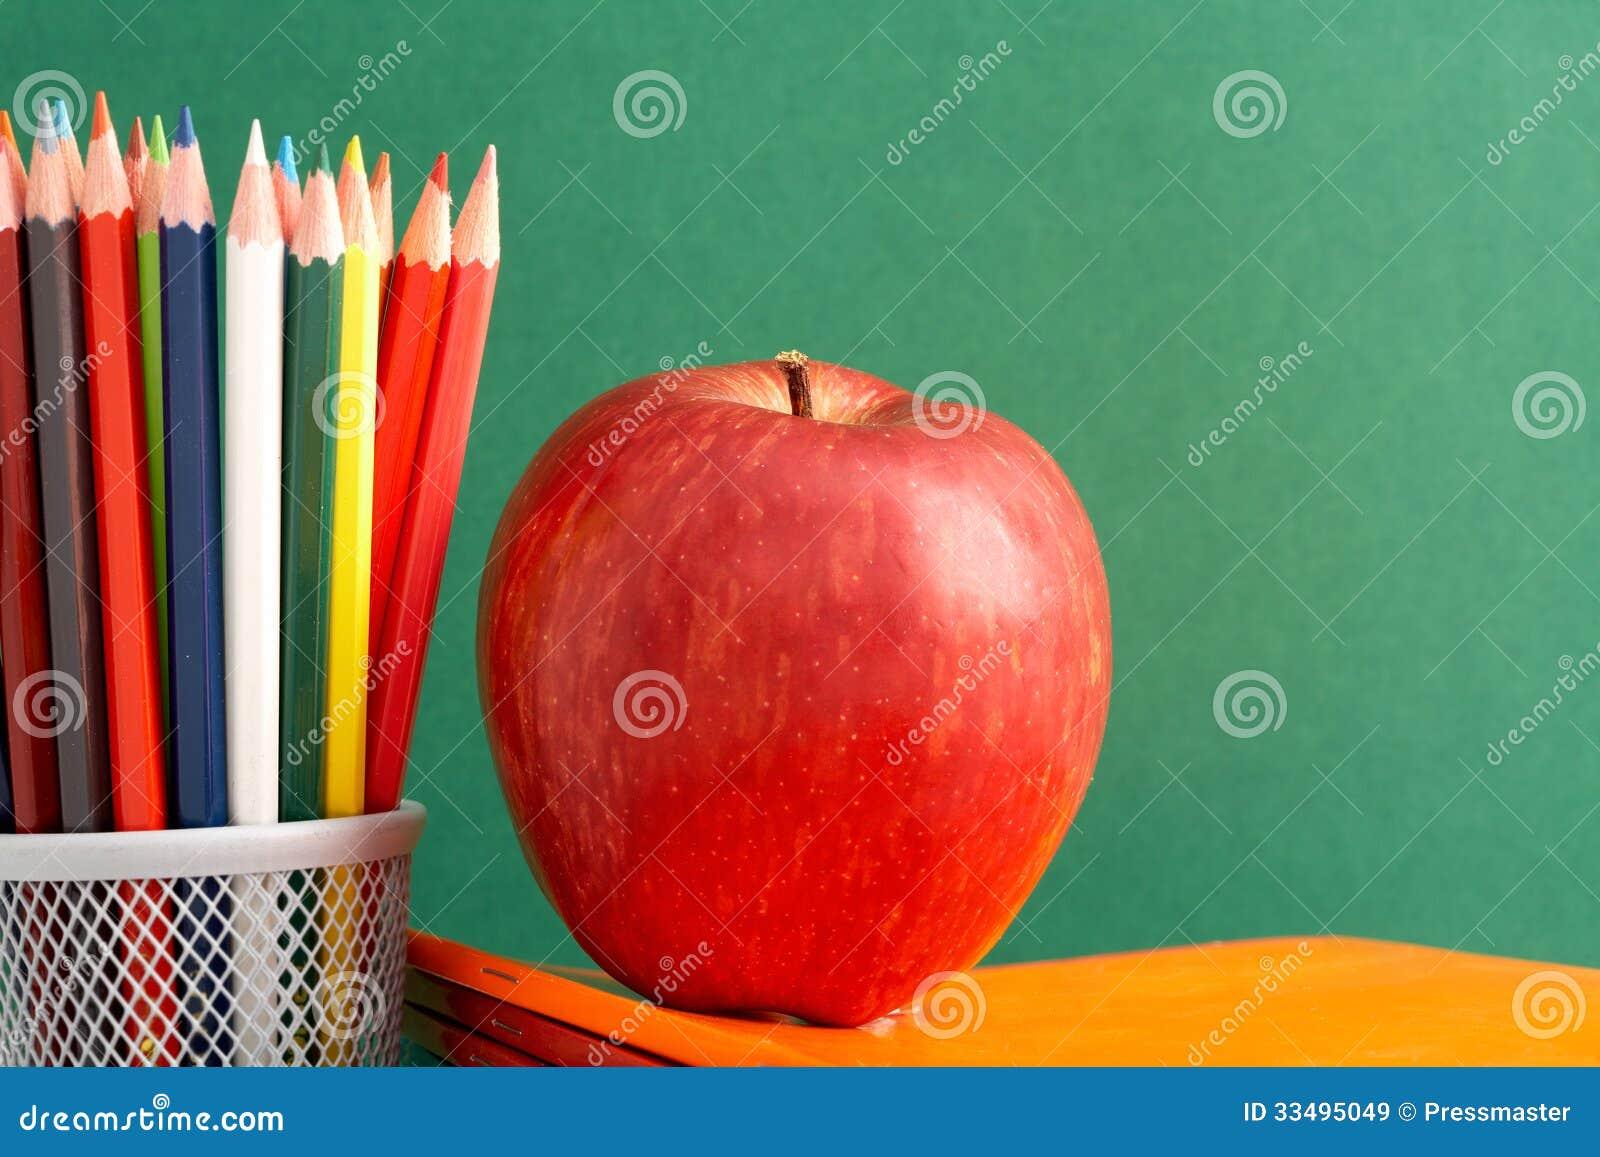 Яблоко и карандаши